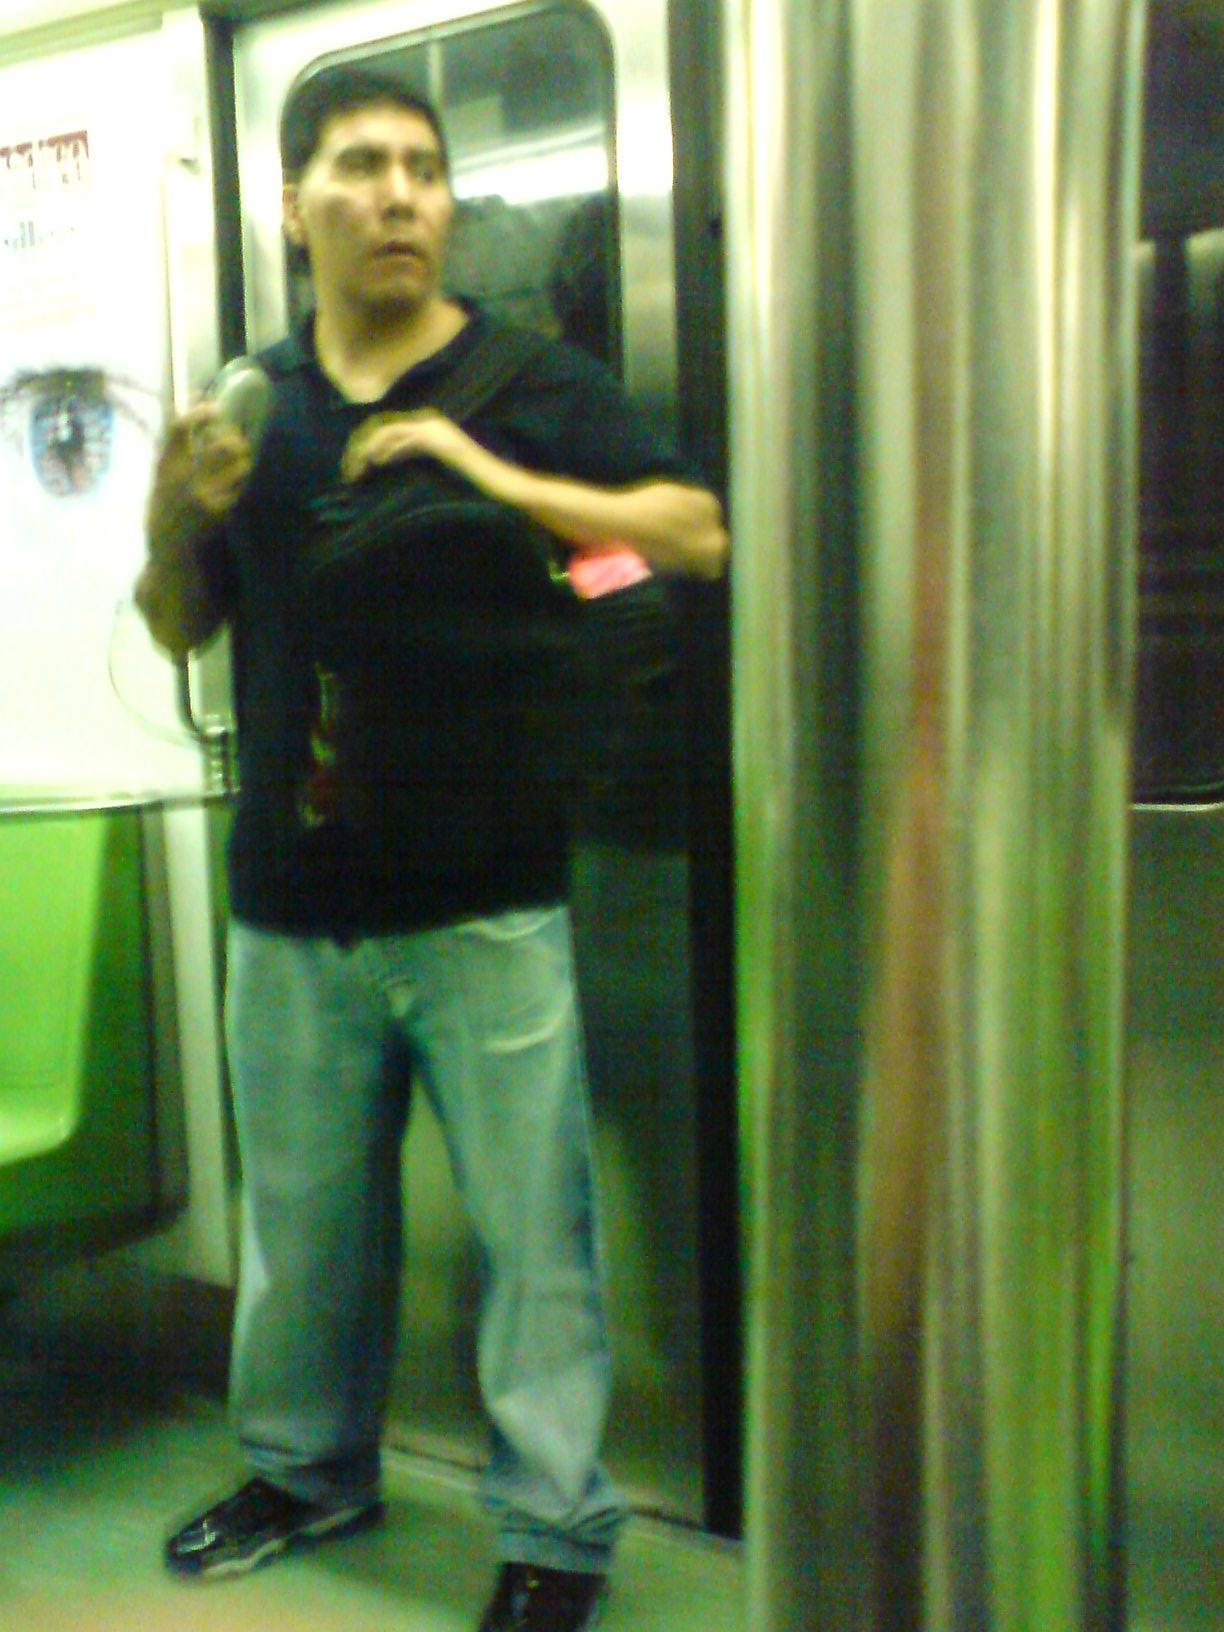 Otro vendedor en la linea 9 del metro